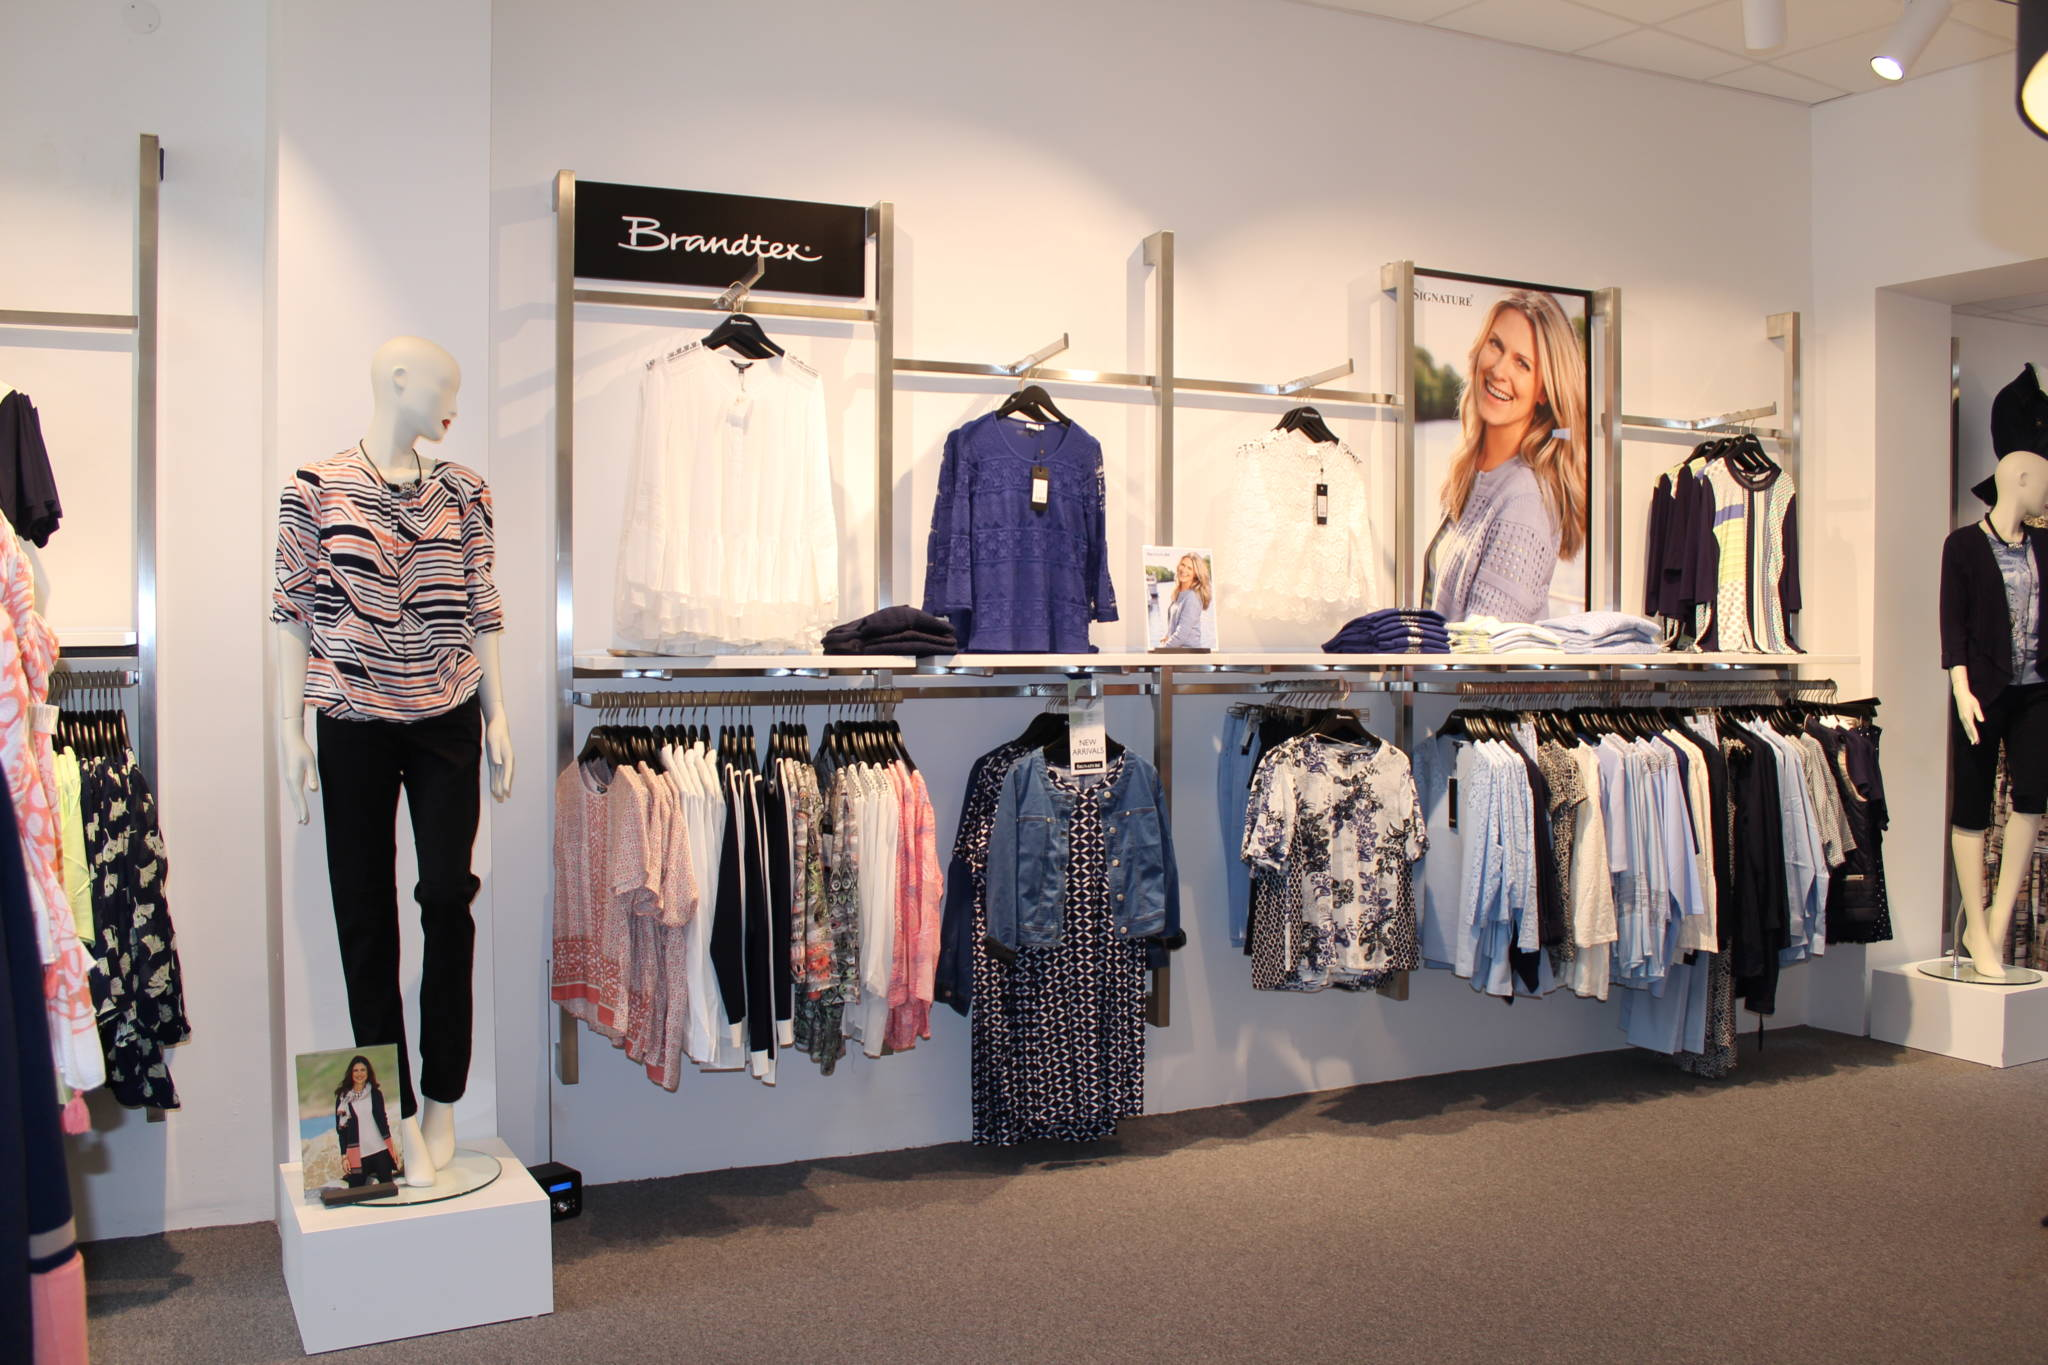 Ny butiksindretning med butiksinventar fra European Mannequins 6 Shop